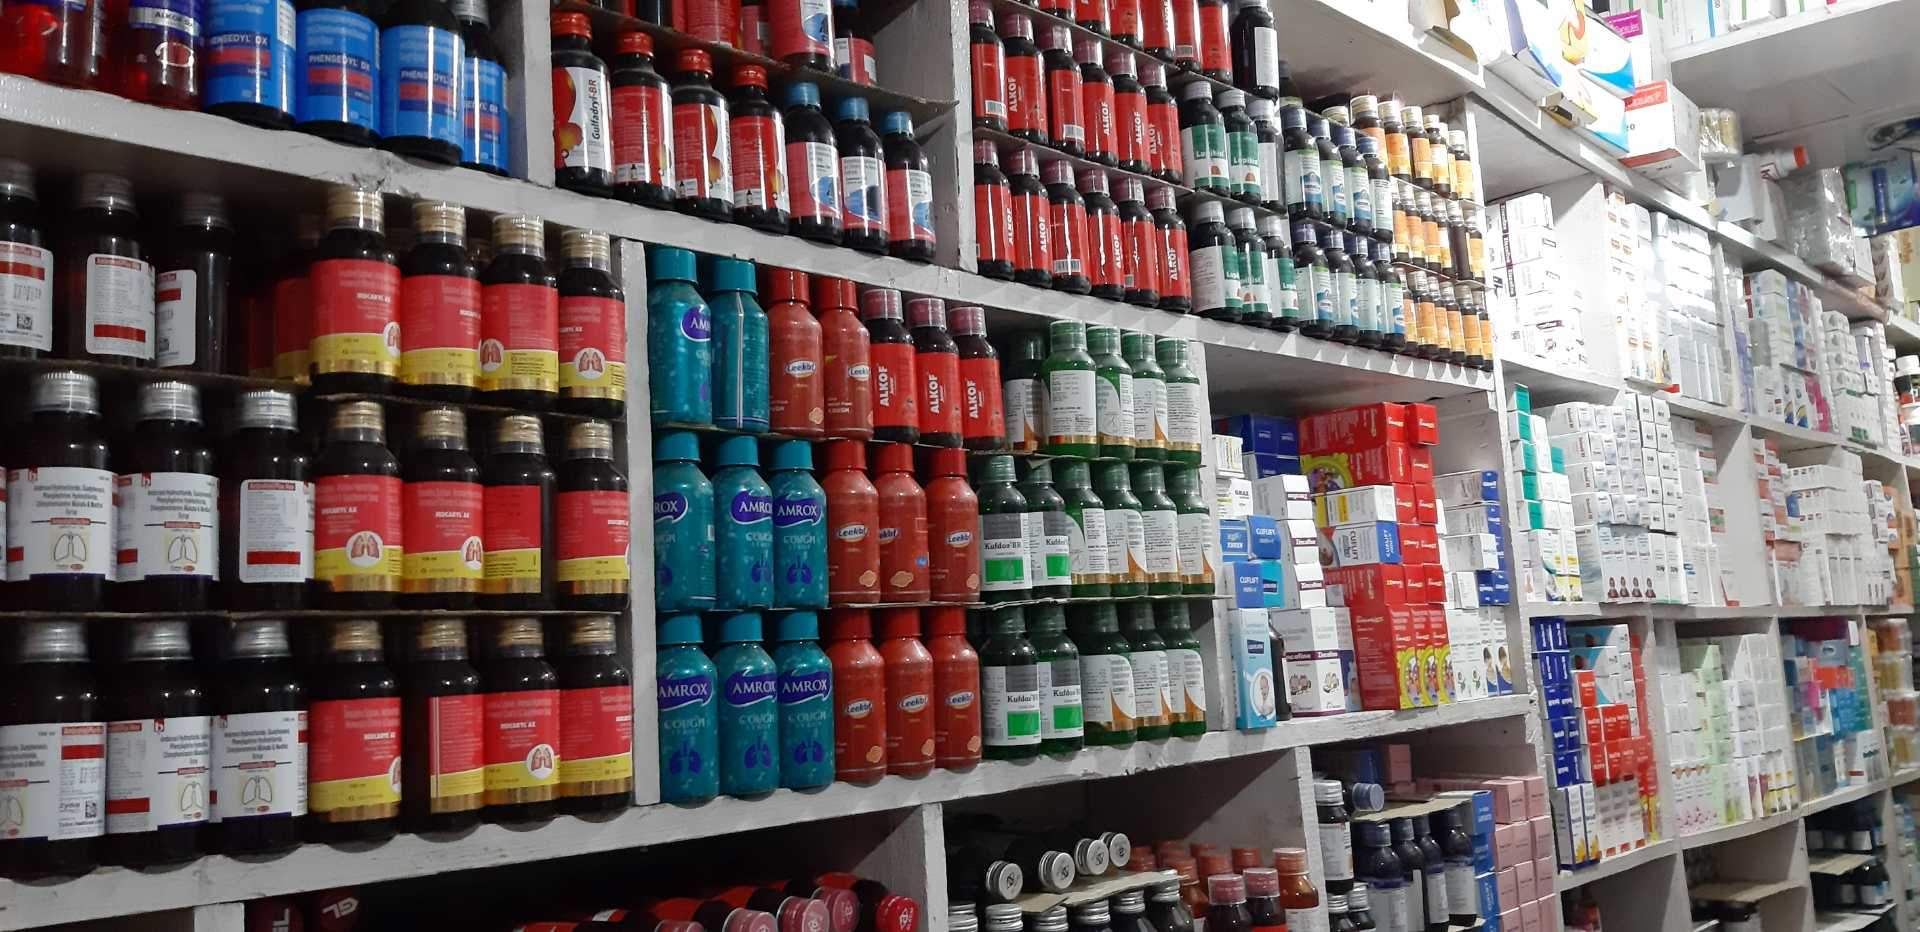 Top 100 Pharmaceutical Distributors in Srinagar - Justdial